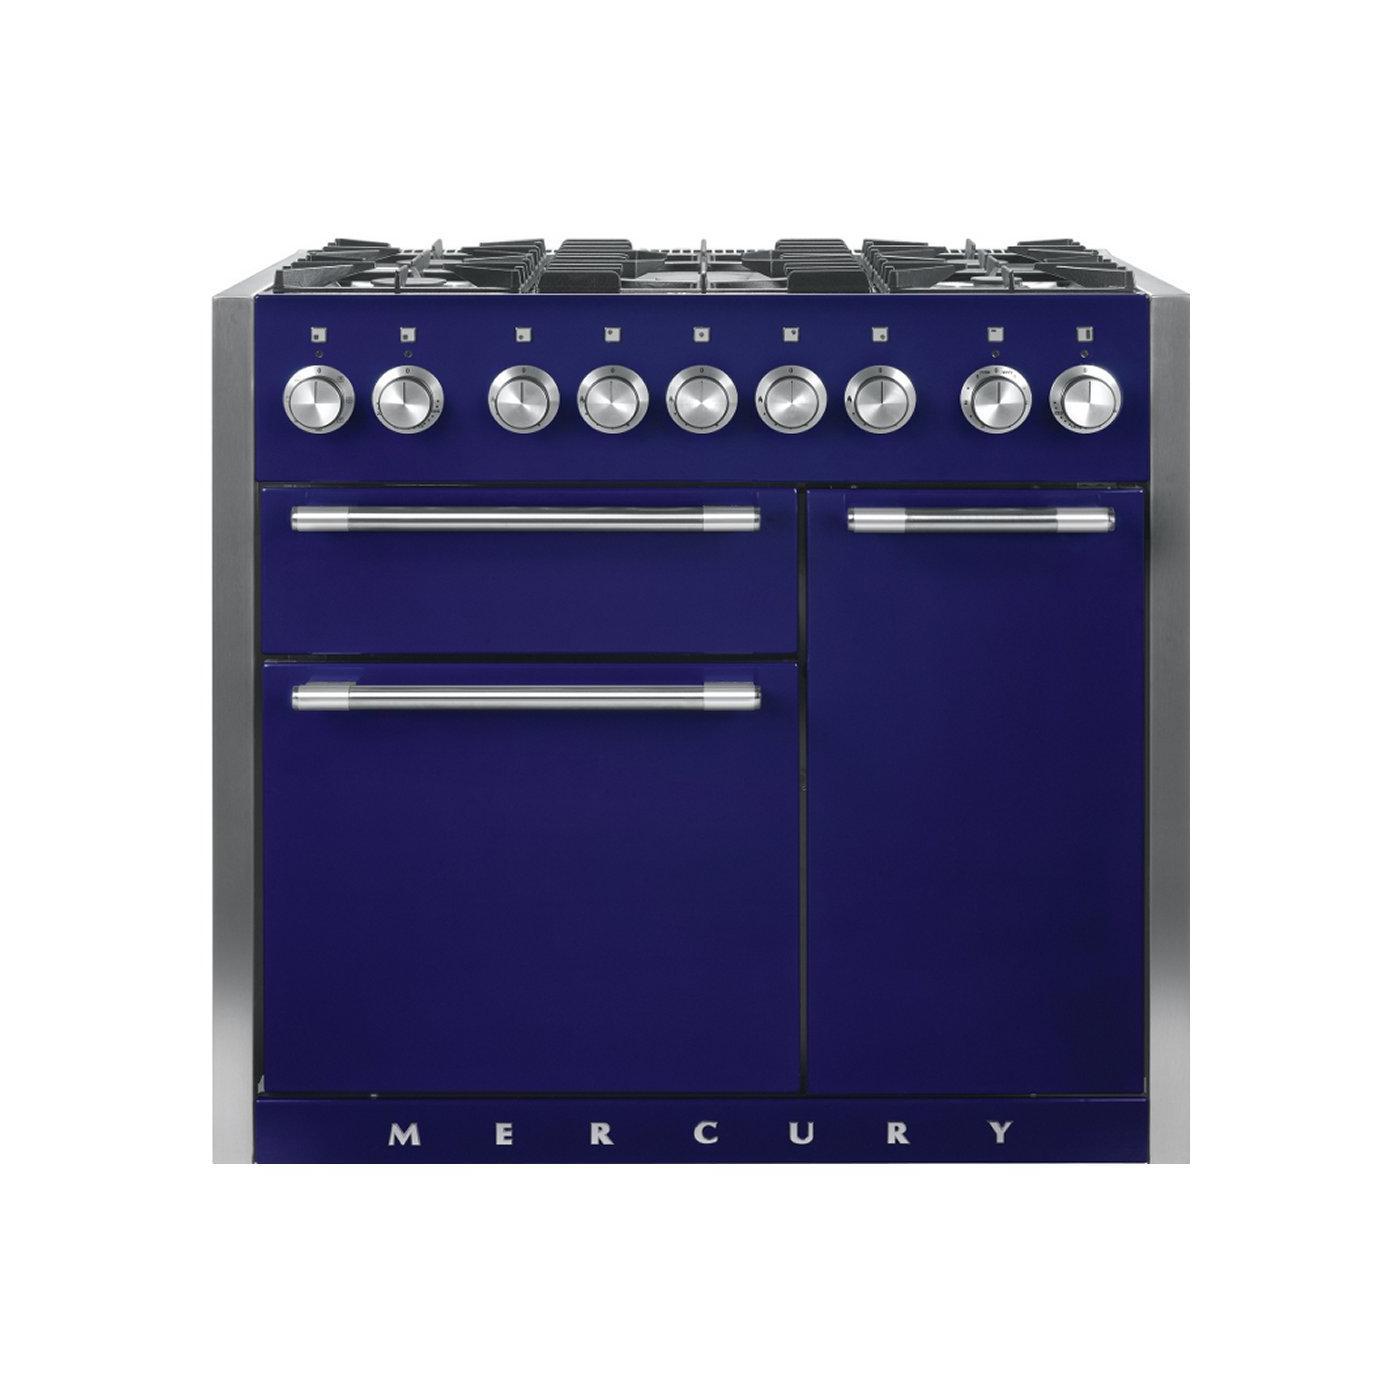 MCY1000DFBB 93190 100cm Dual Fuel Range Cooker